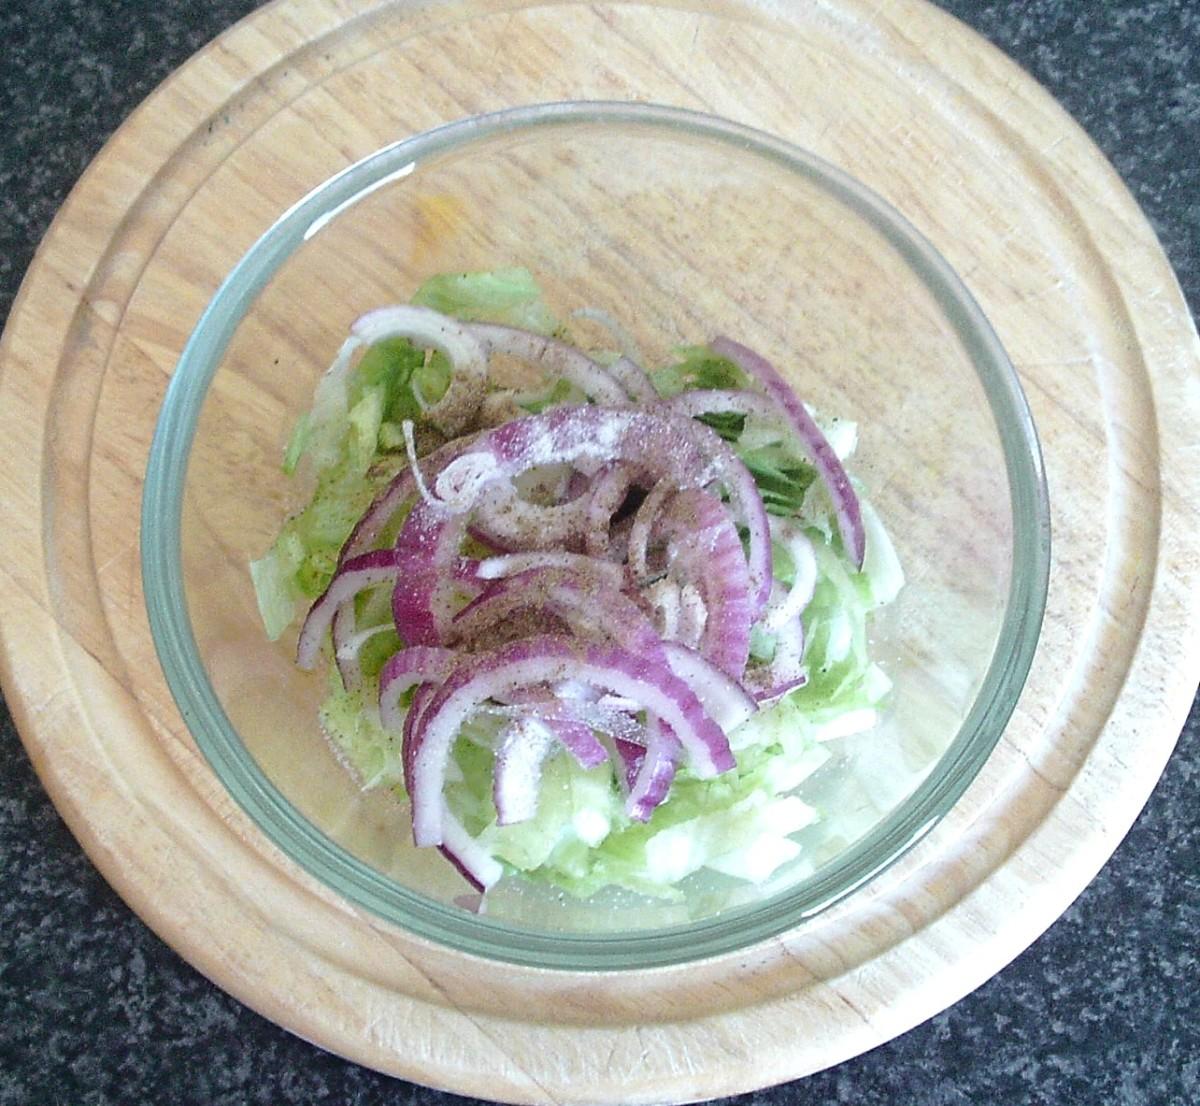 Seasoned lettuce and onion